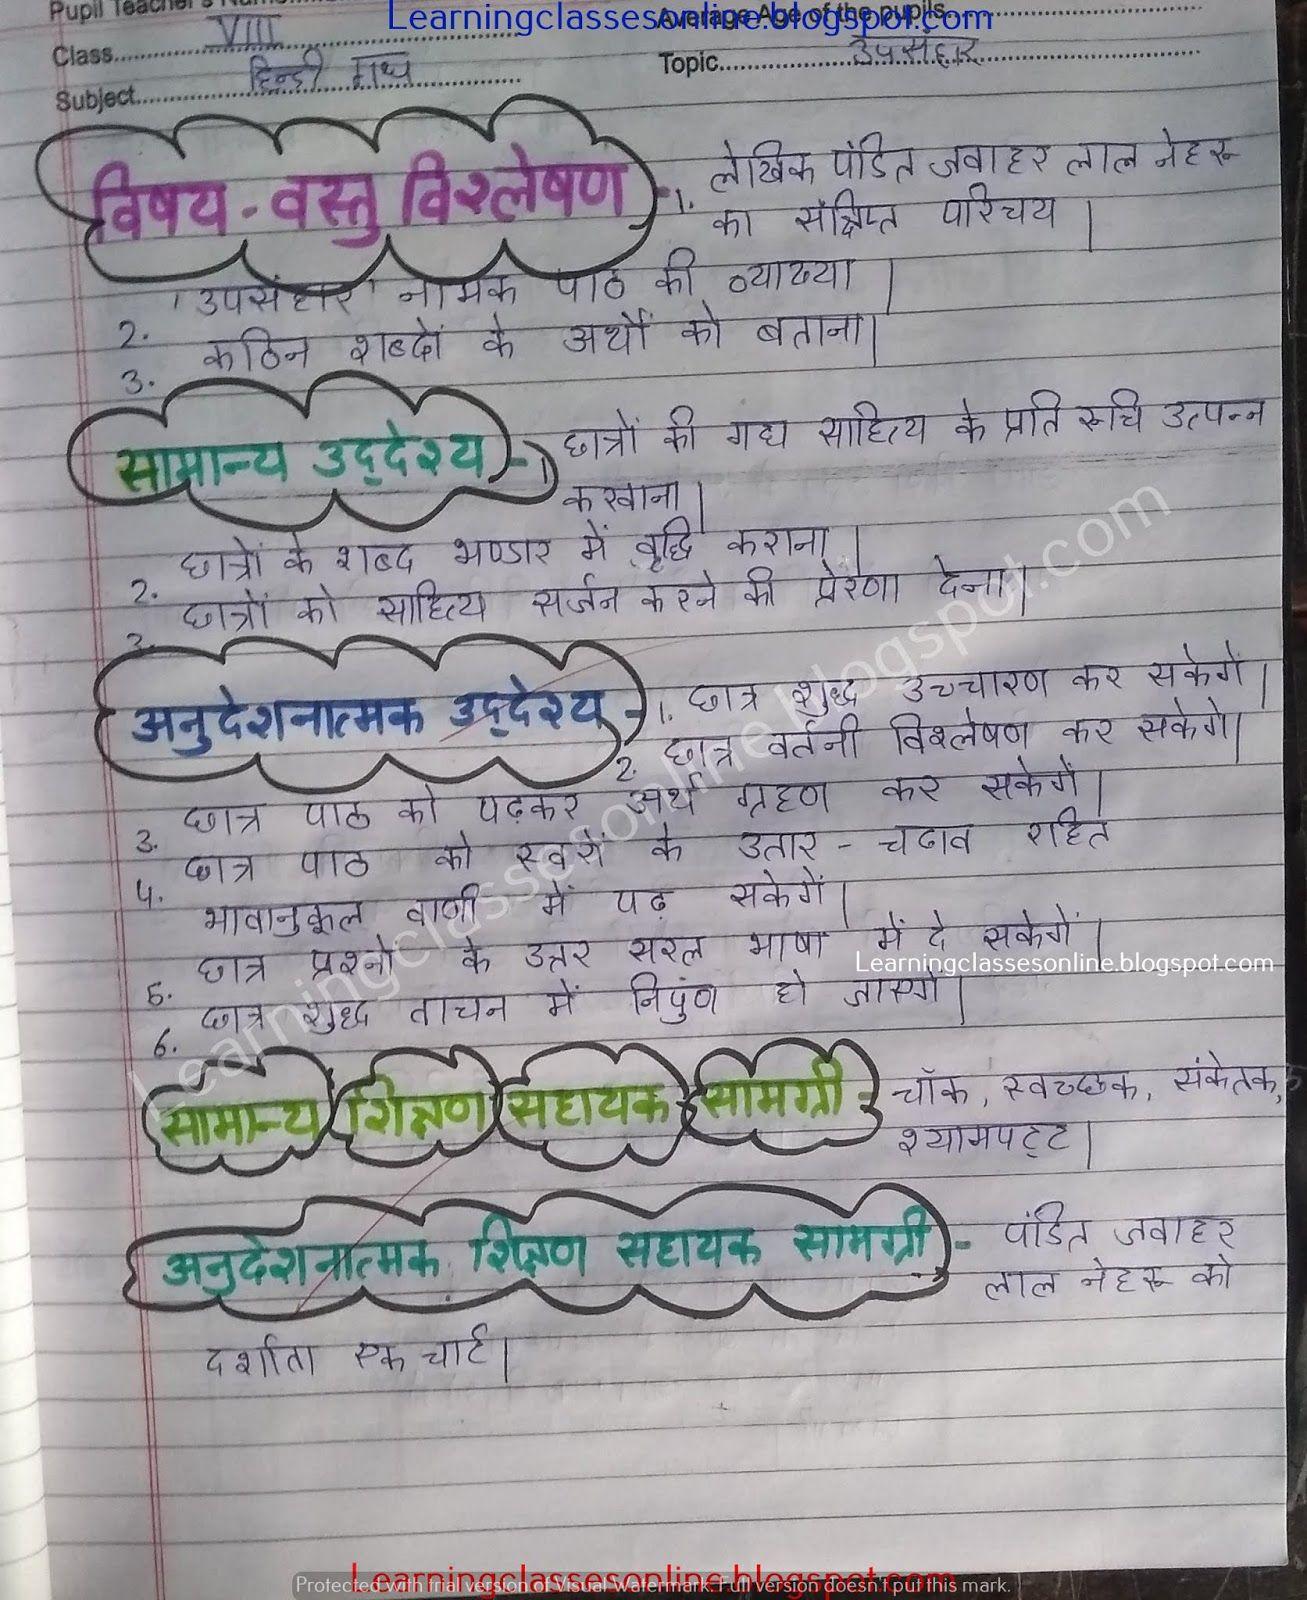 Ncert Class 8 Hindi Gadya Lesson Plan For Teachers Of Hindi Subject On Pandit Jawaharlal Nehru Up Teacher Lesson Plans Lesson Plan In Hindi Ias Study Material [ 1600 x 1307 Pixel ]